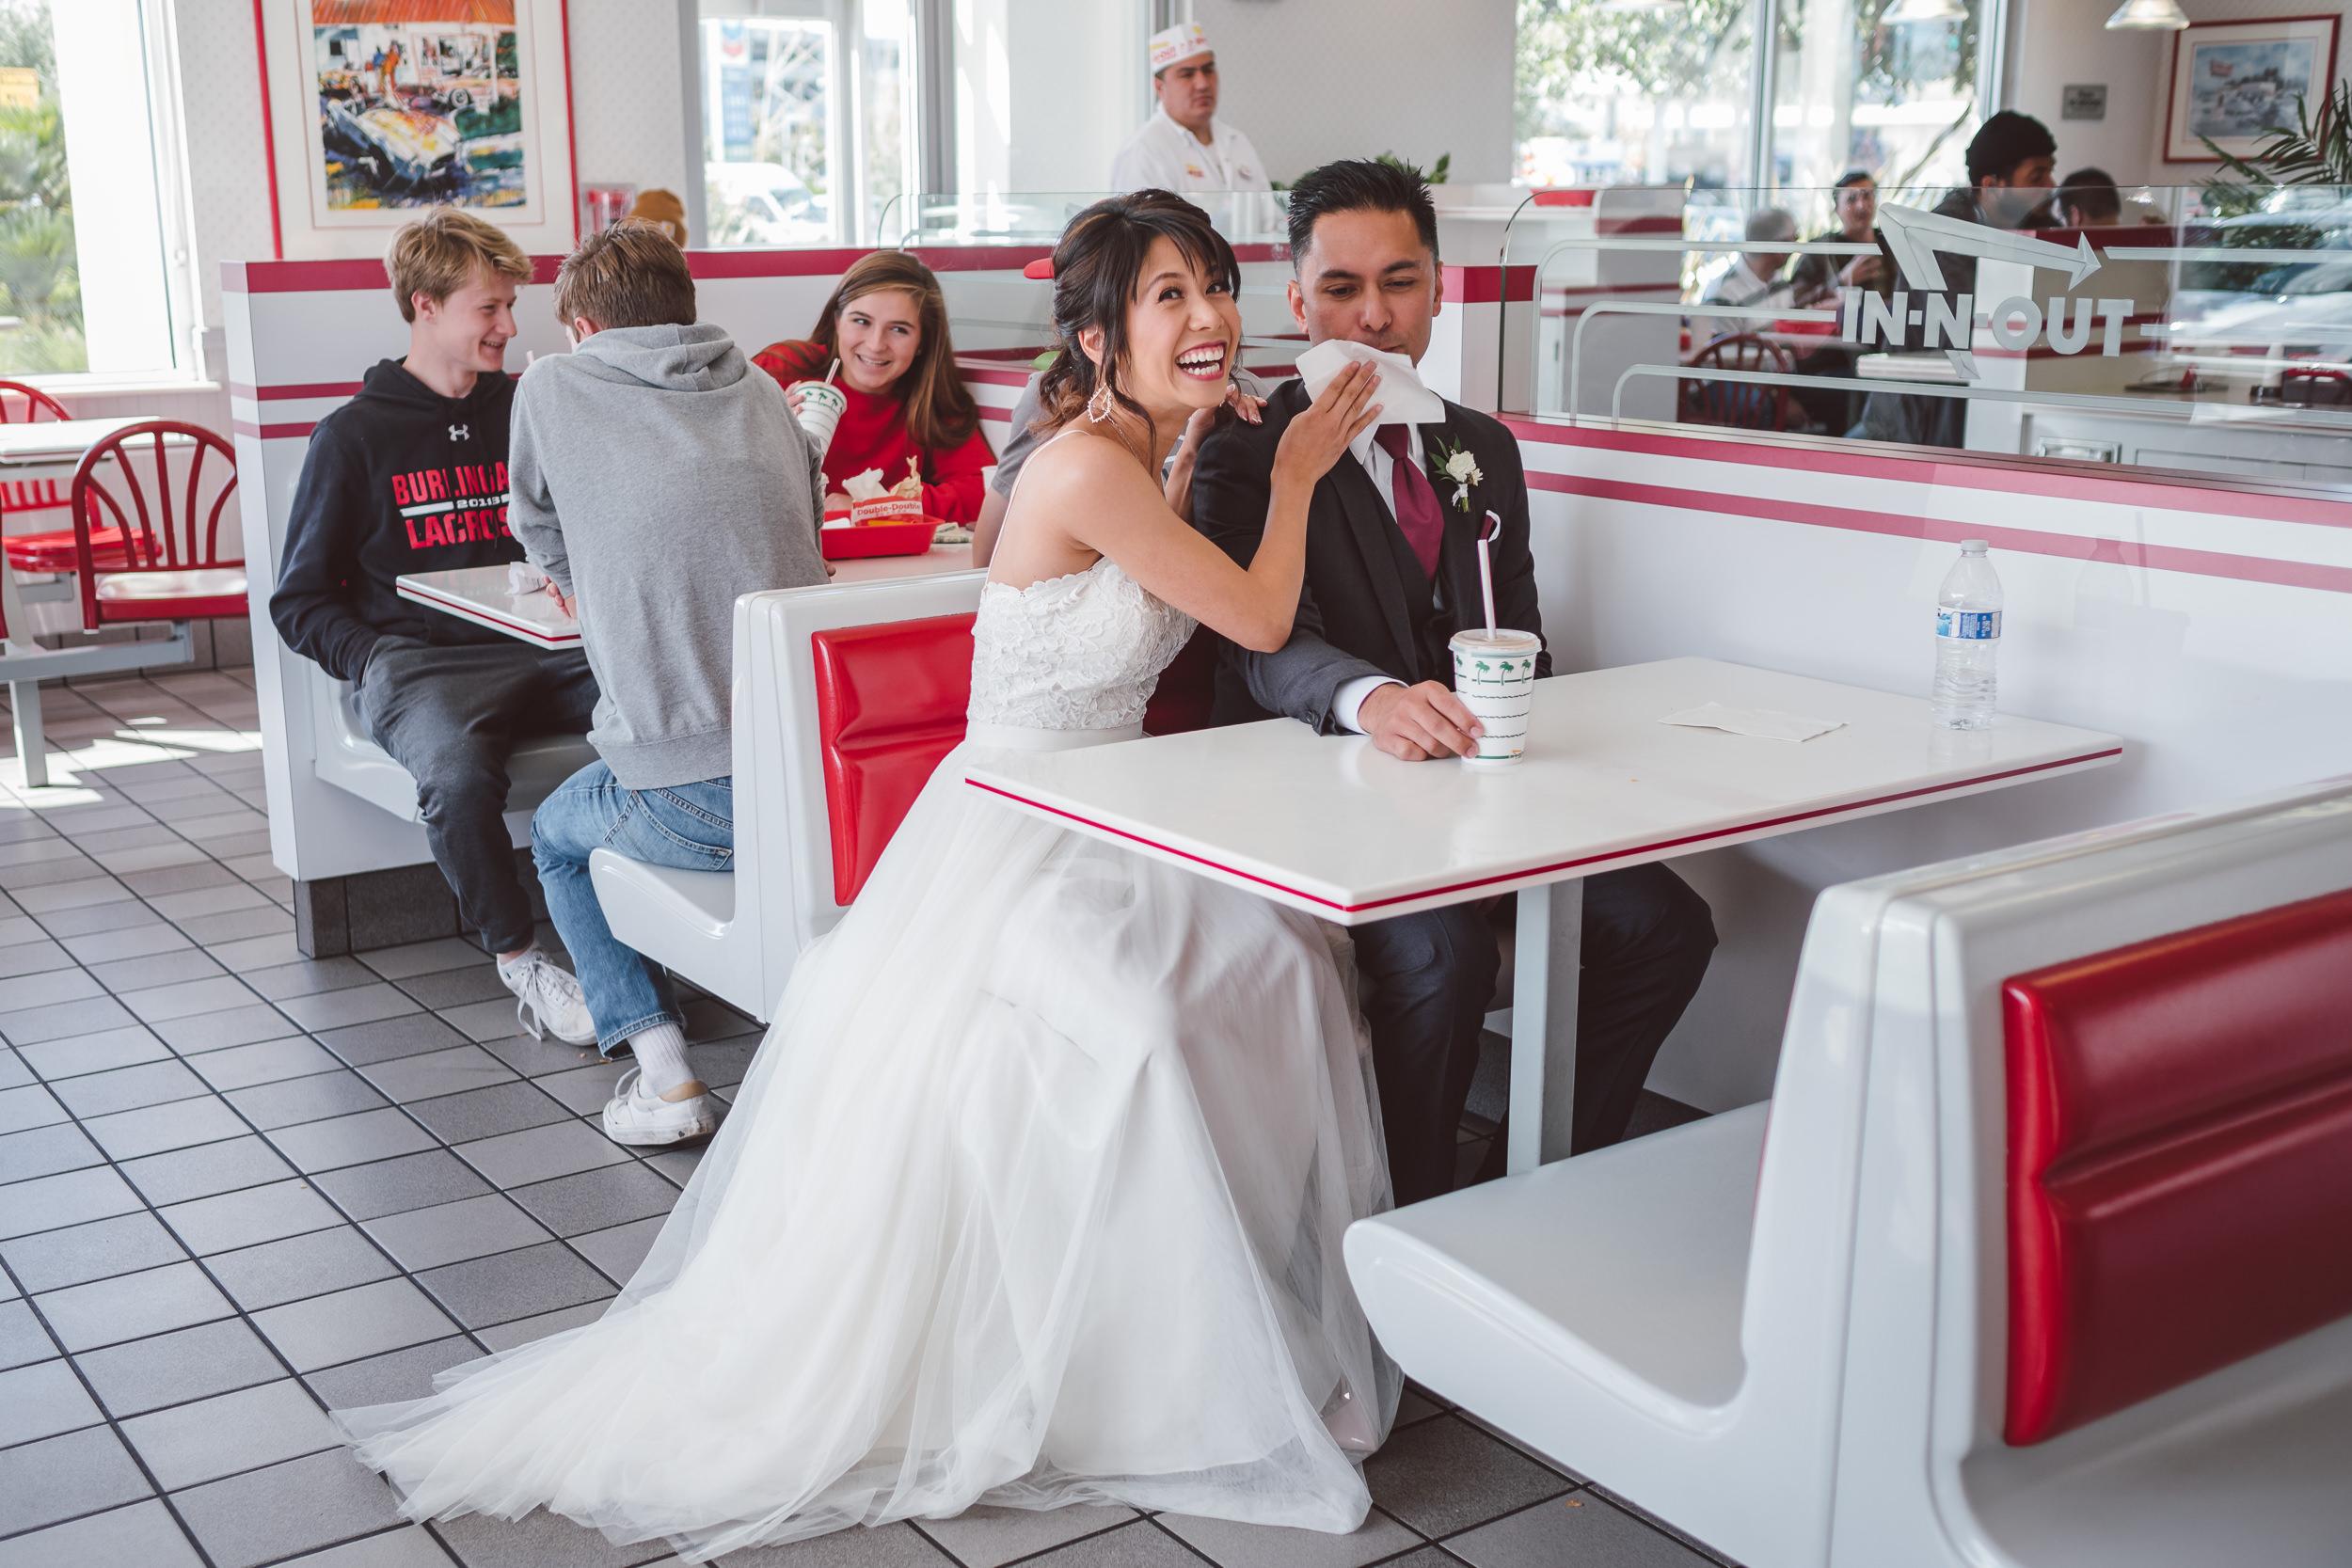 San-Francisco-City-Hall-Wedding-Photography-080.jpg